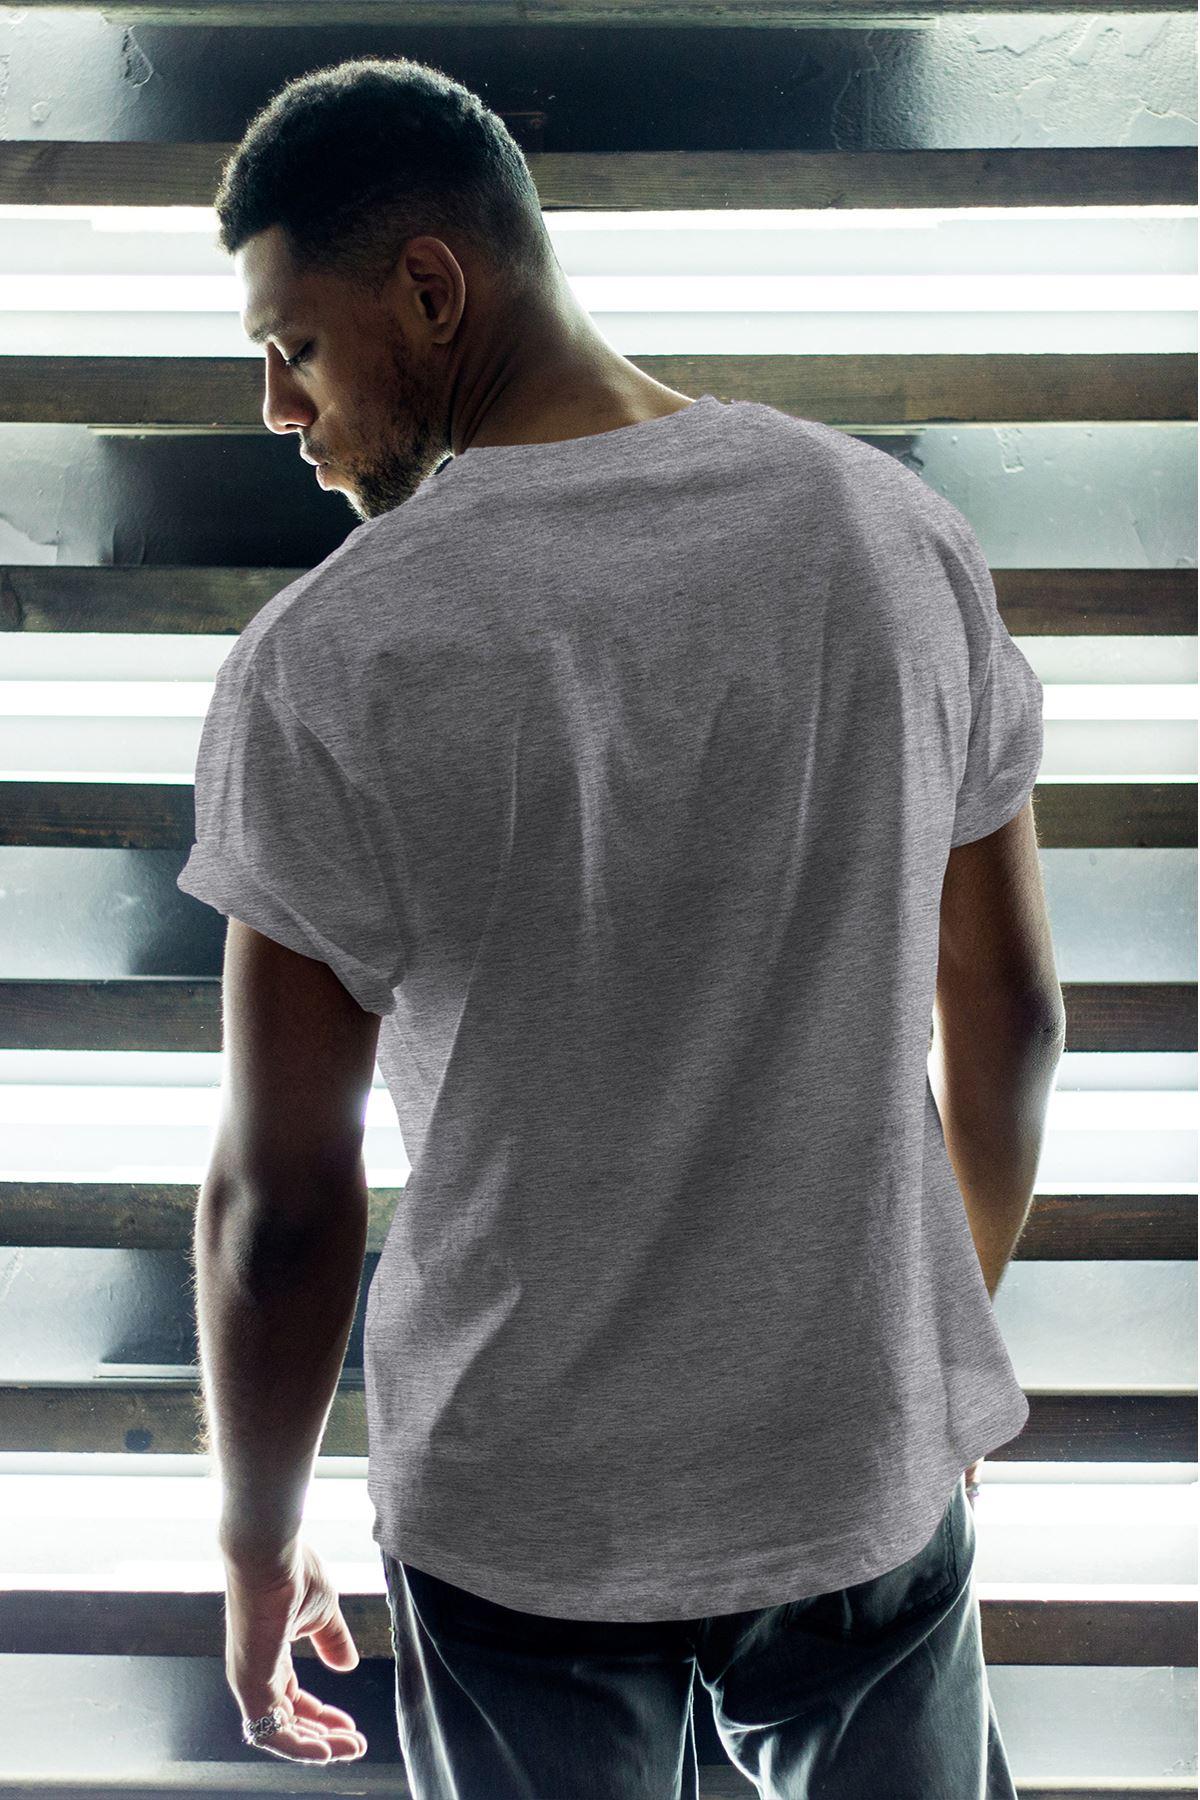 Boston Celtics 24 Gri Erkek Oversize Tshirt - Tişört